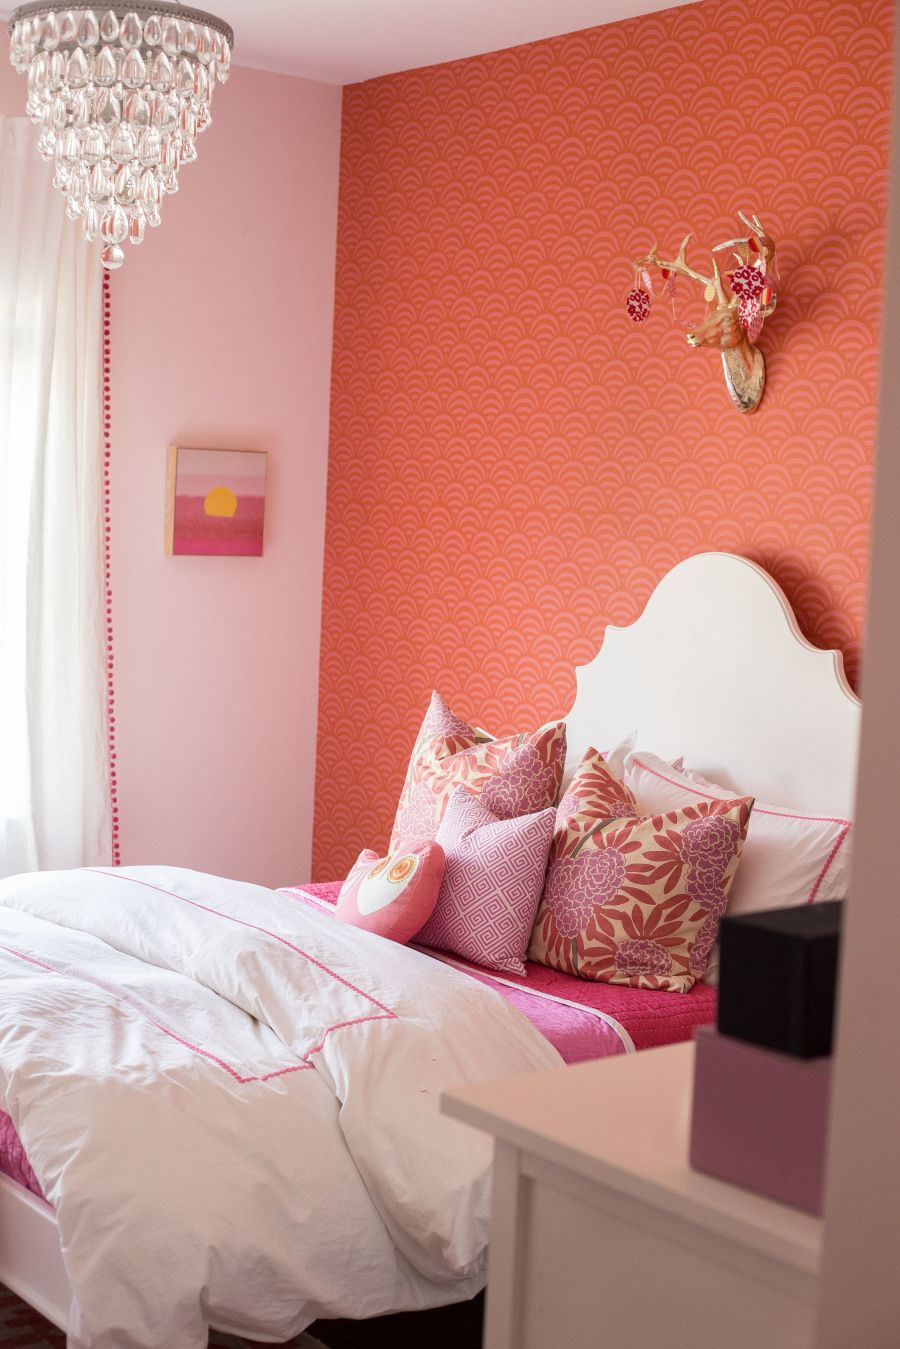 Kinderzimmer decke design tween girl bedroom by darling darleen  aly  pinterest